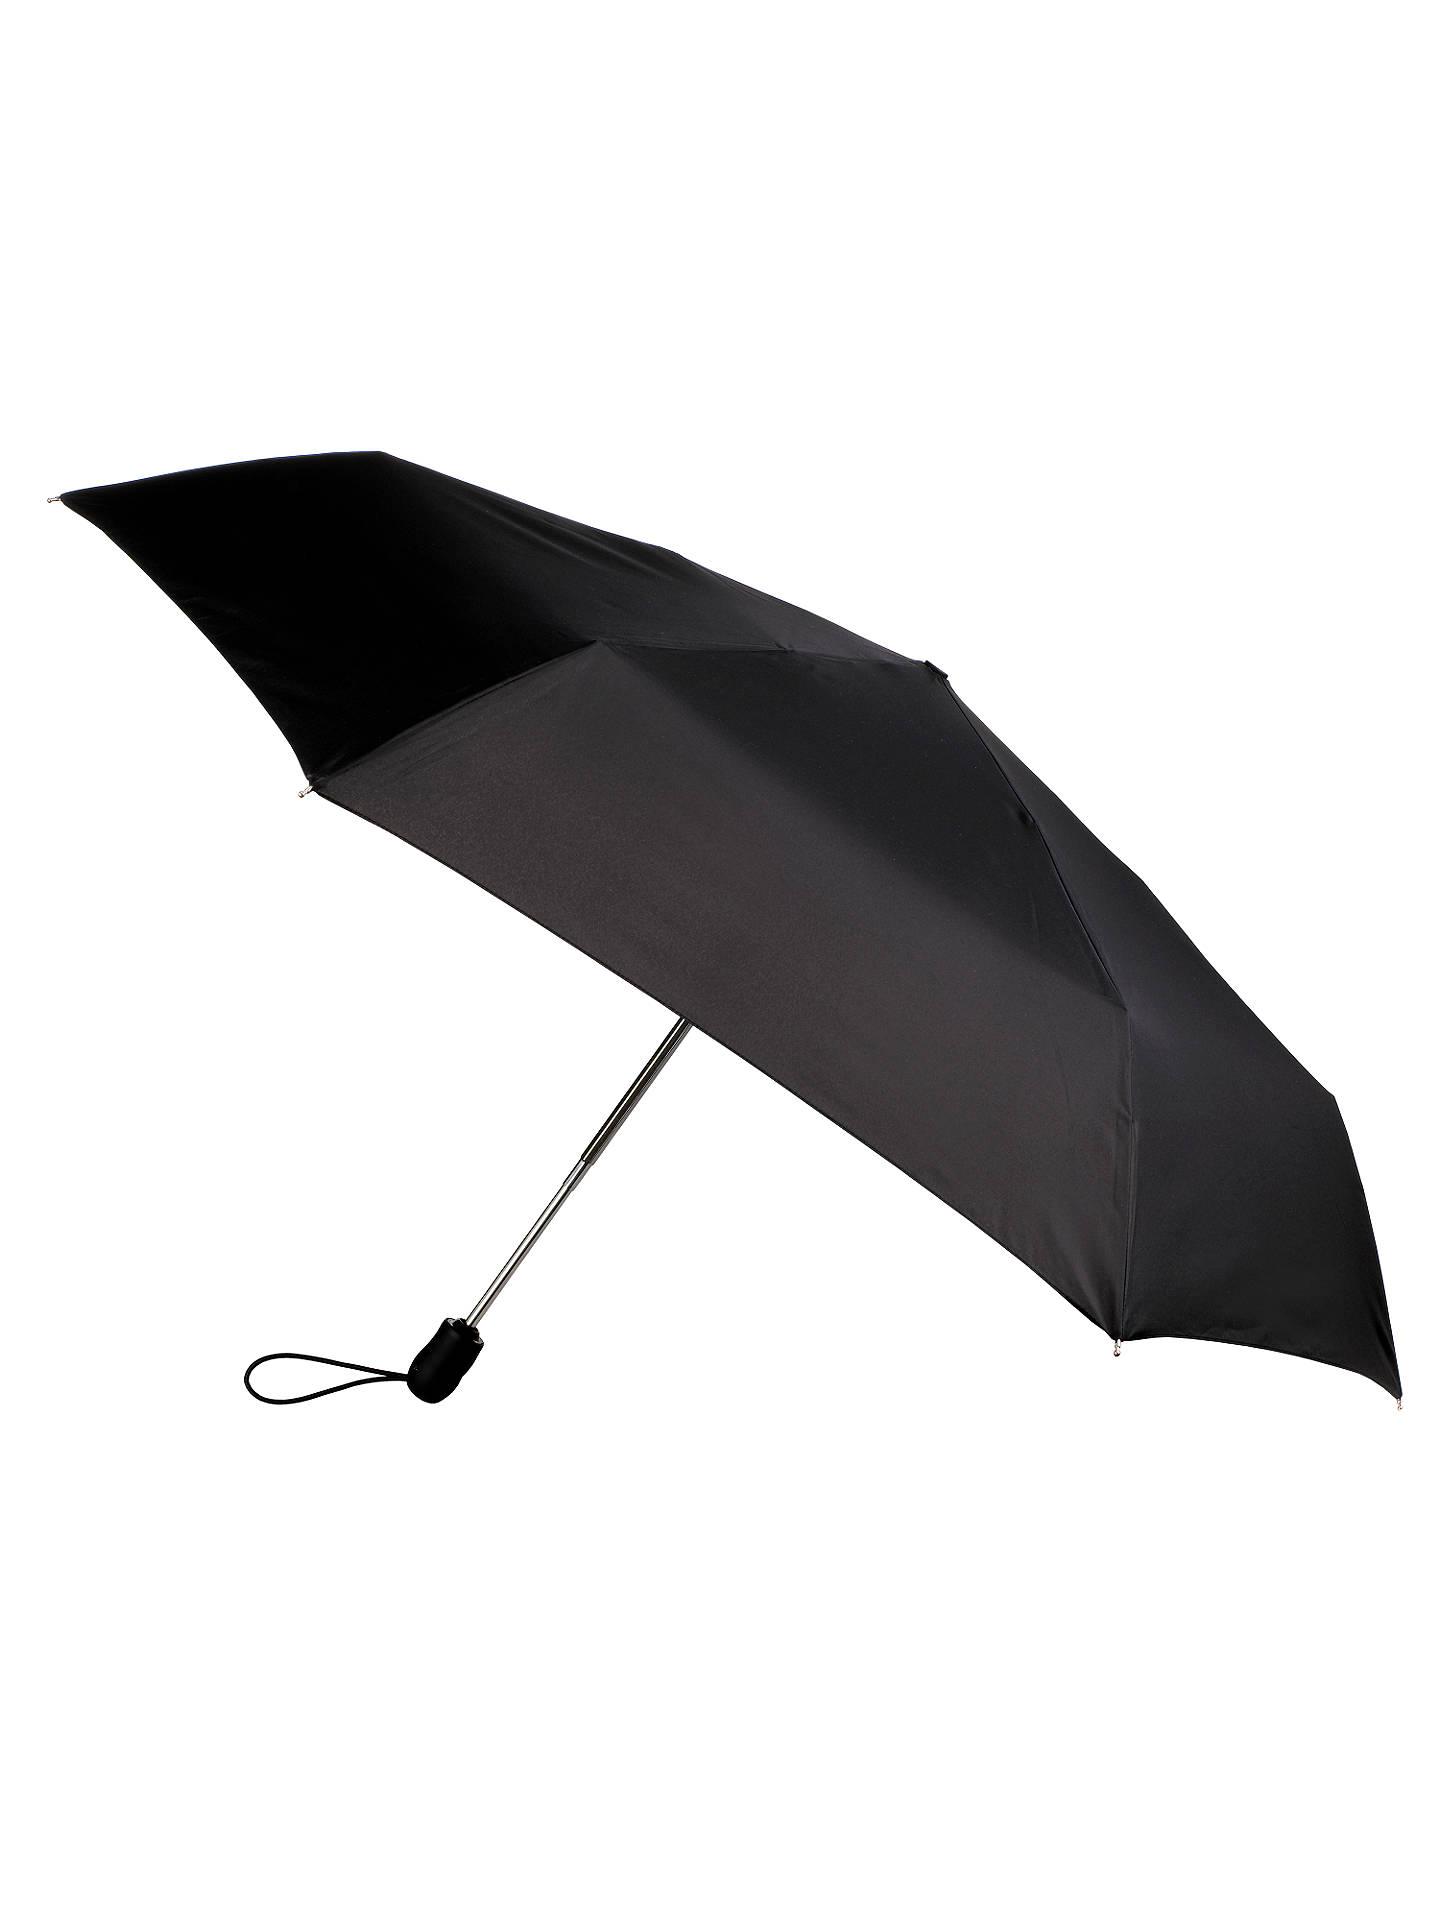 110b78db069b Fulton Open & Close Superslim-1 Umbrella, Black